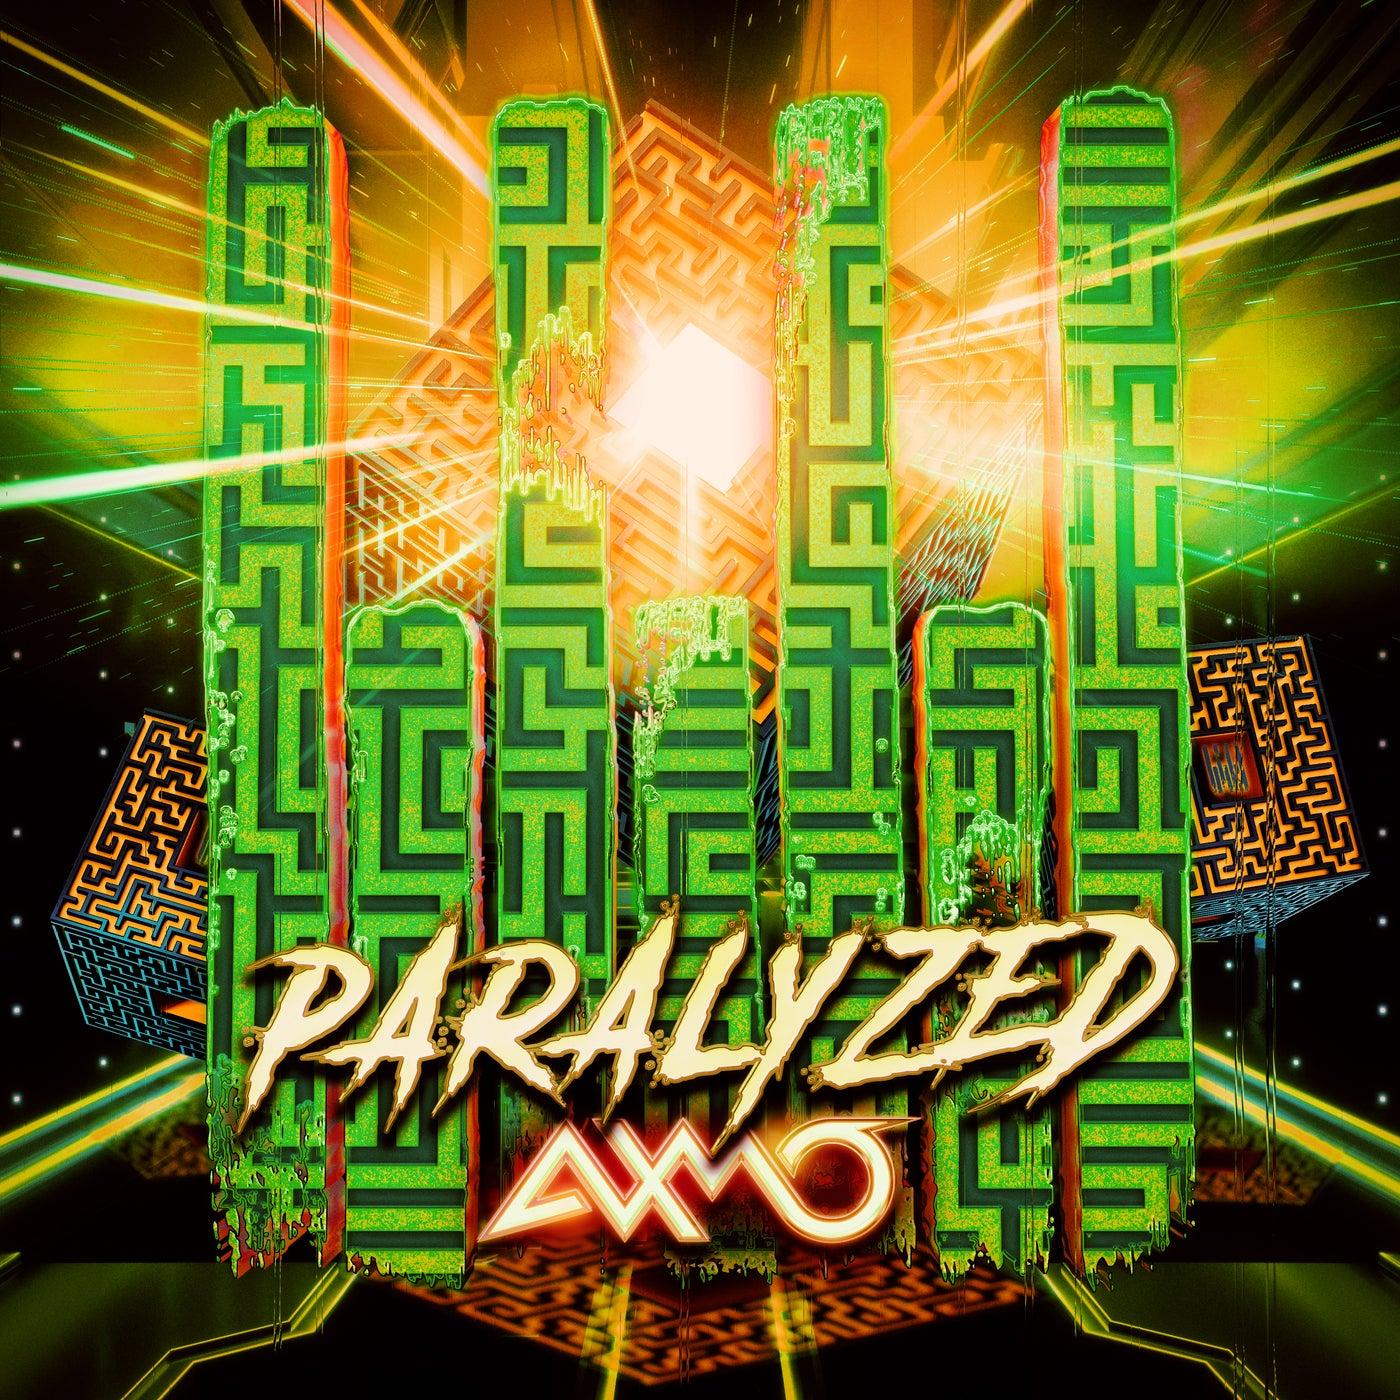 Paralyzed (Extended Mix)